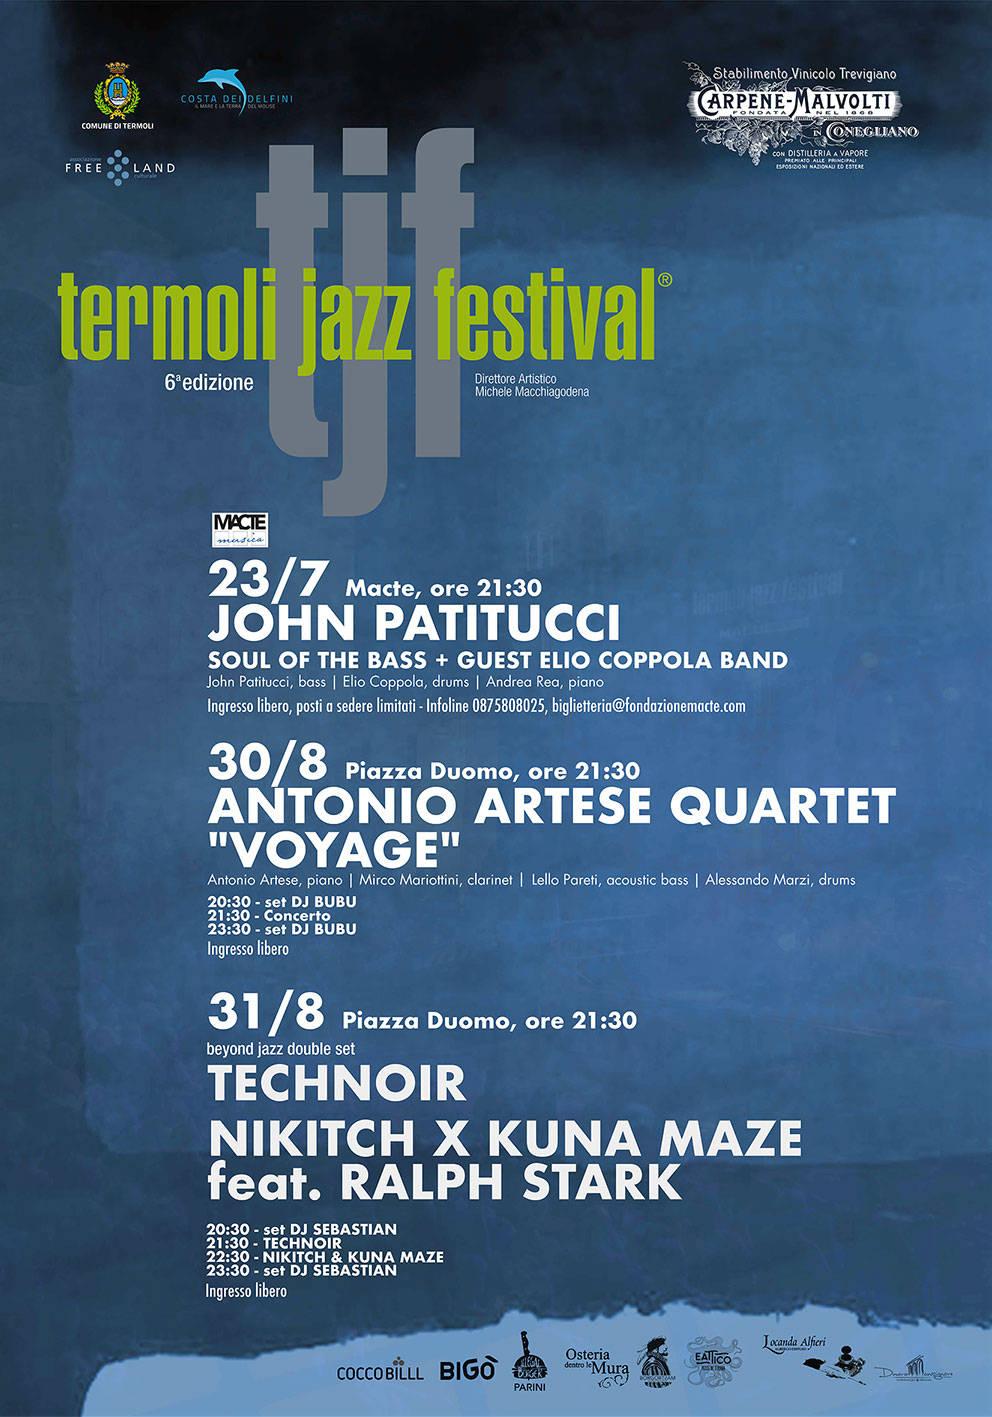 locandina Termoli jazz festival